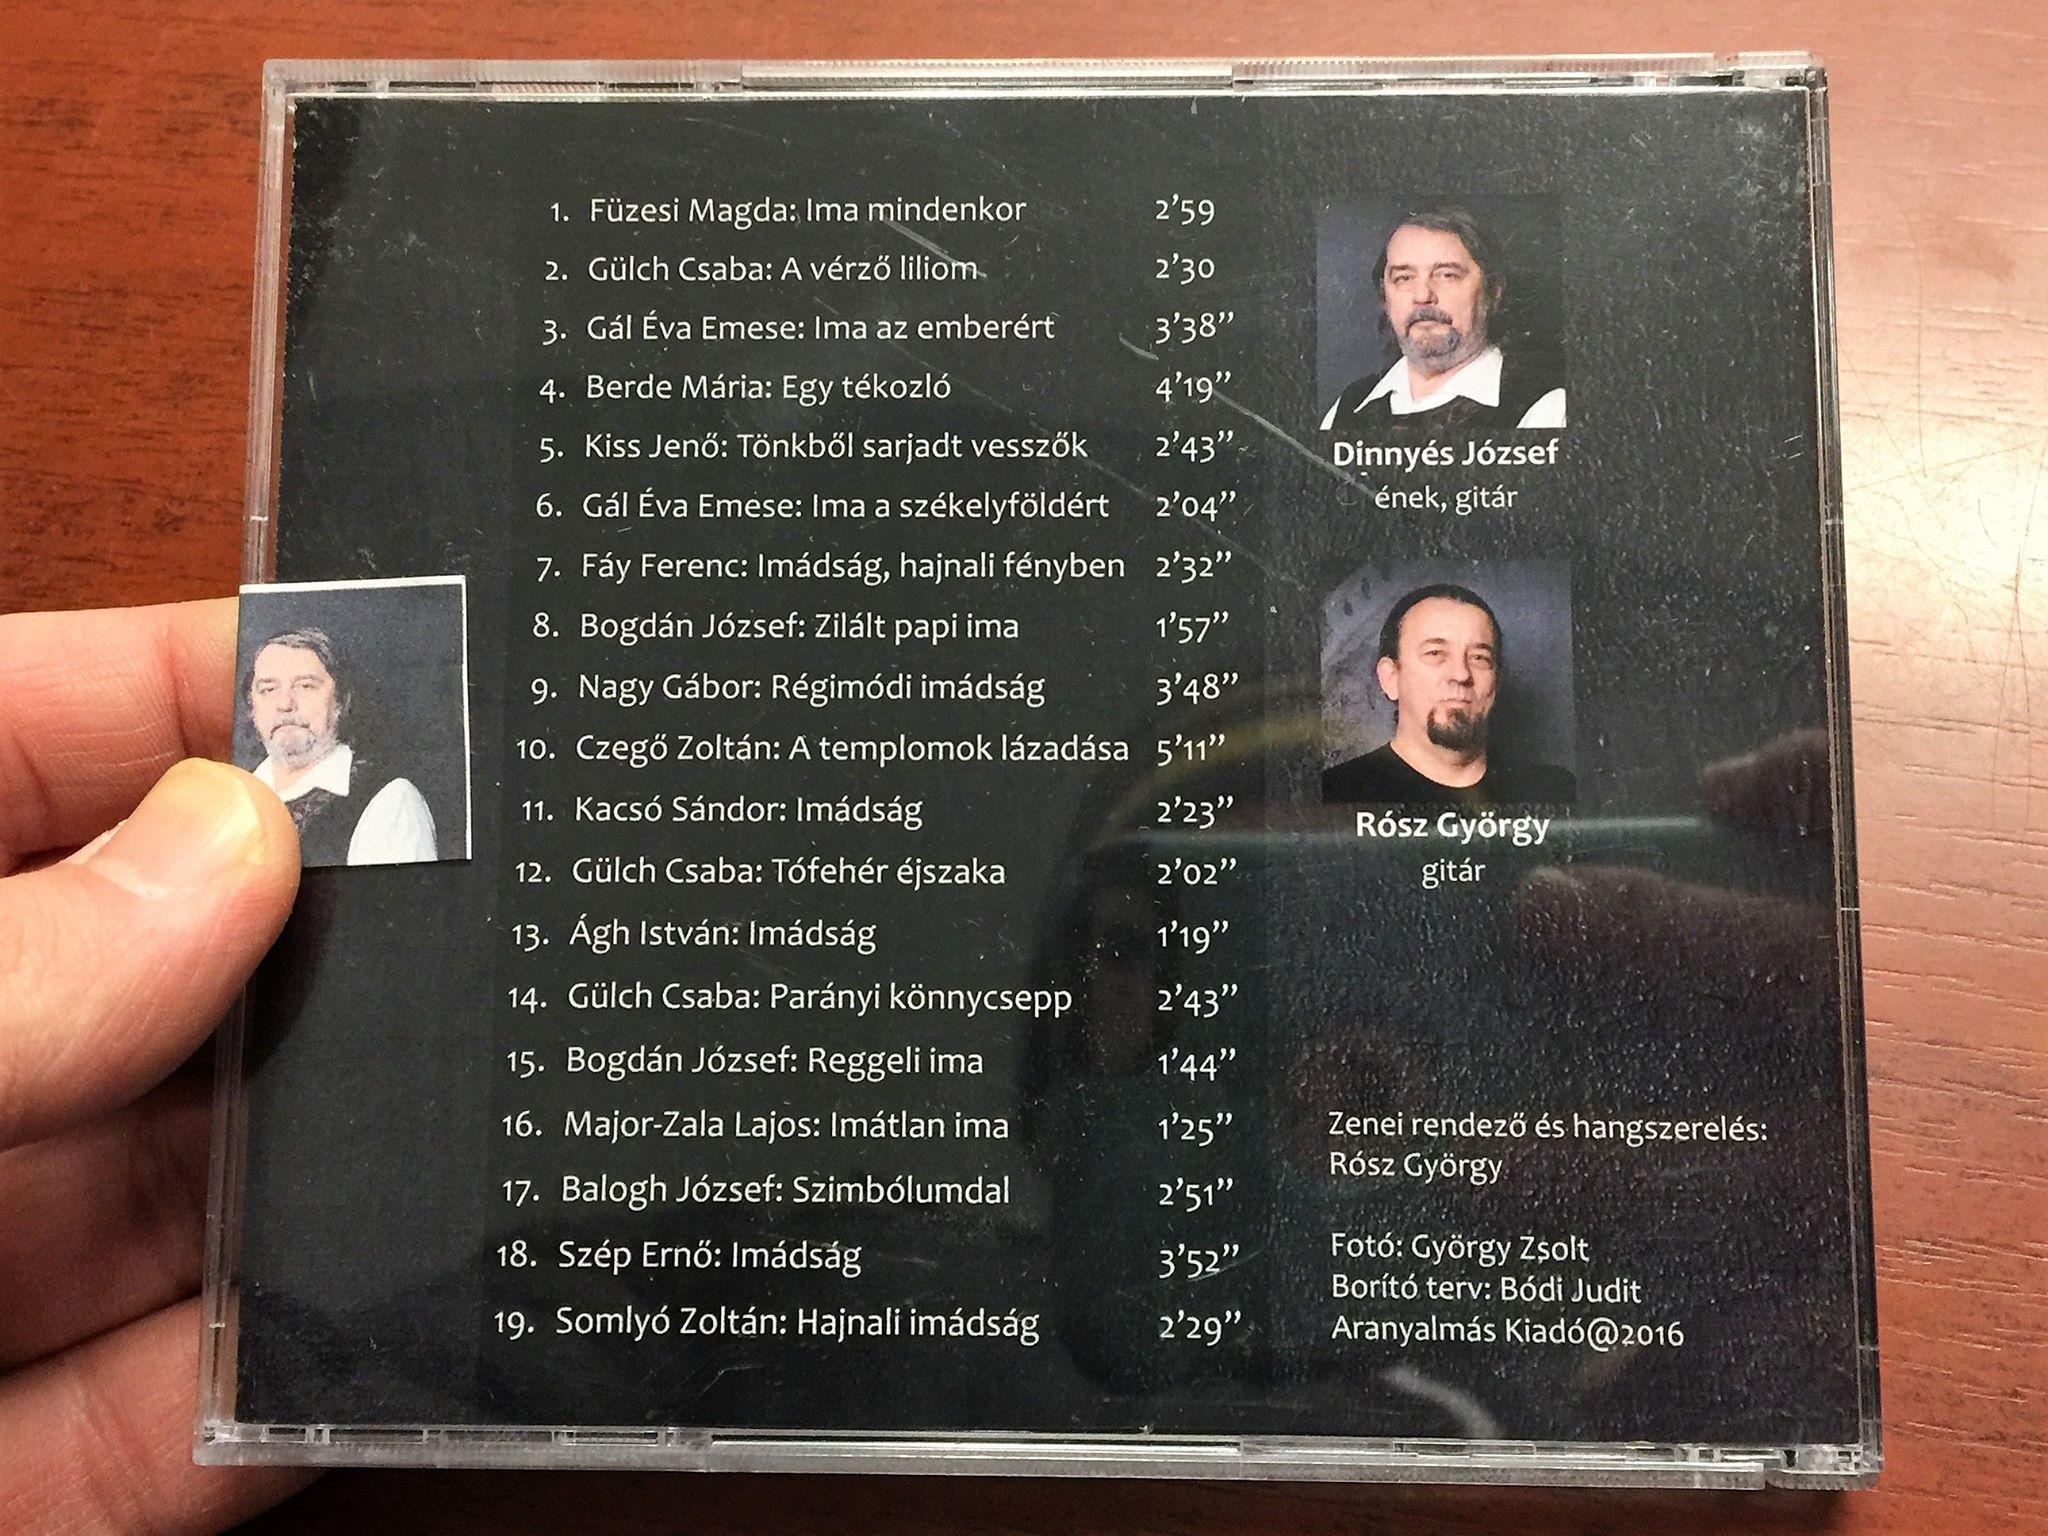 a-templomok-l-zad-sa-the-rebbelion-of-the-temples-dinny-s-j-zsef-r-sz-gy-rgy-hungarian-cd-2016-aranyalm-s-kiad-50-year-anniversary-recording-2-.jpg